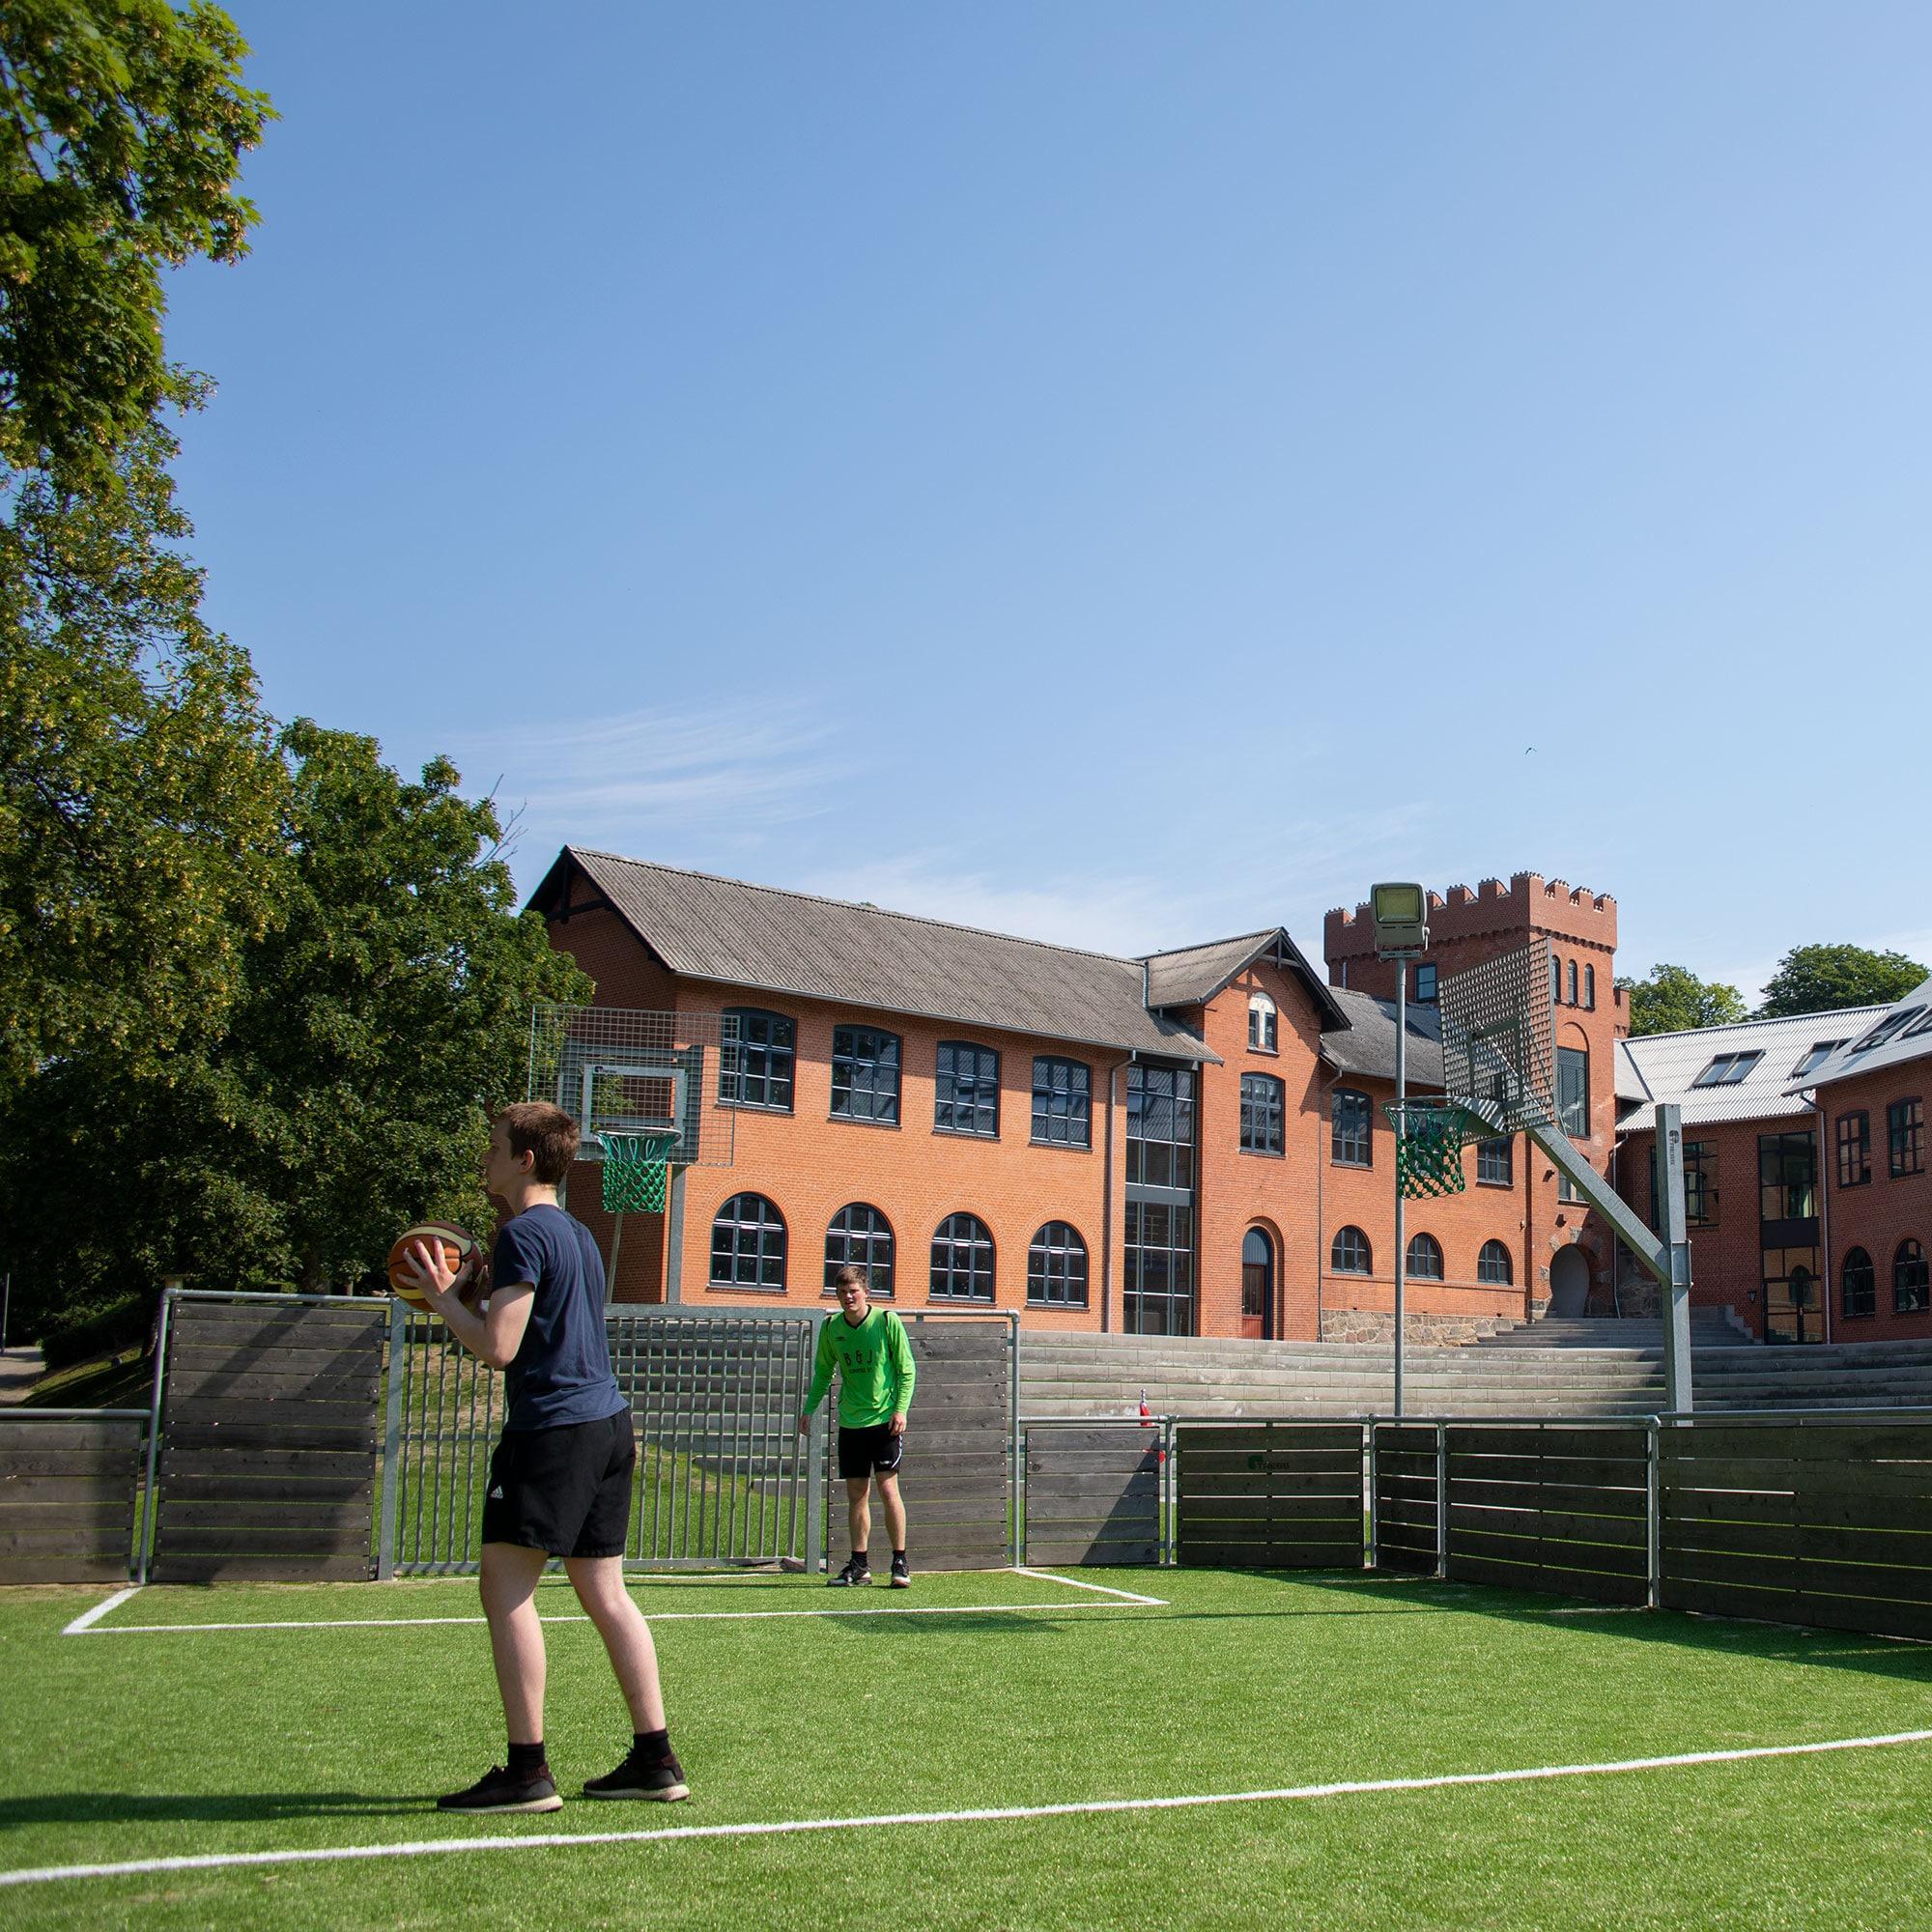 Fritid på Bogø Kostskole